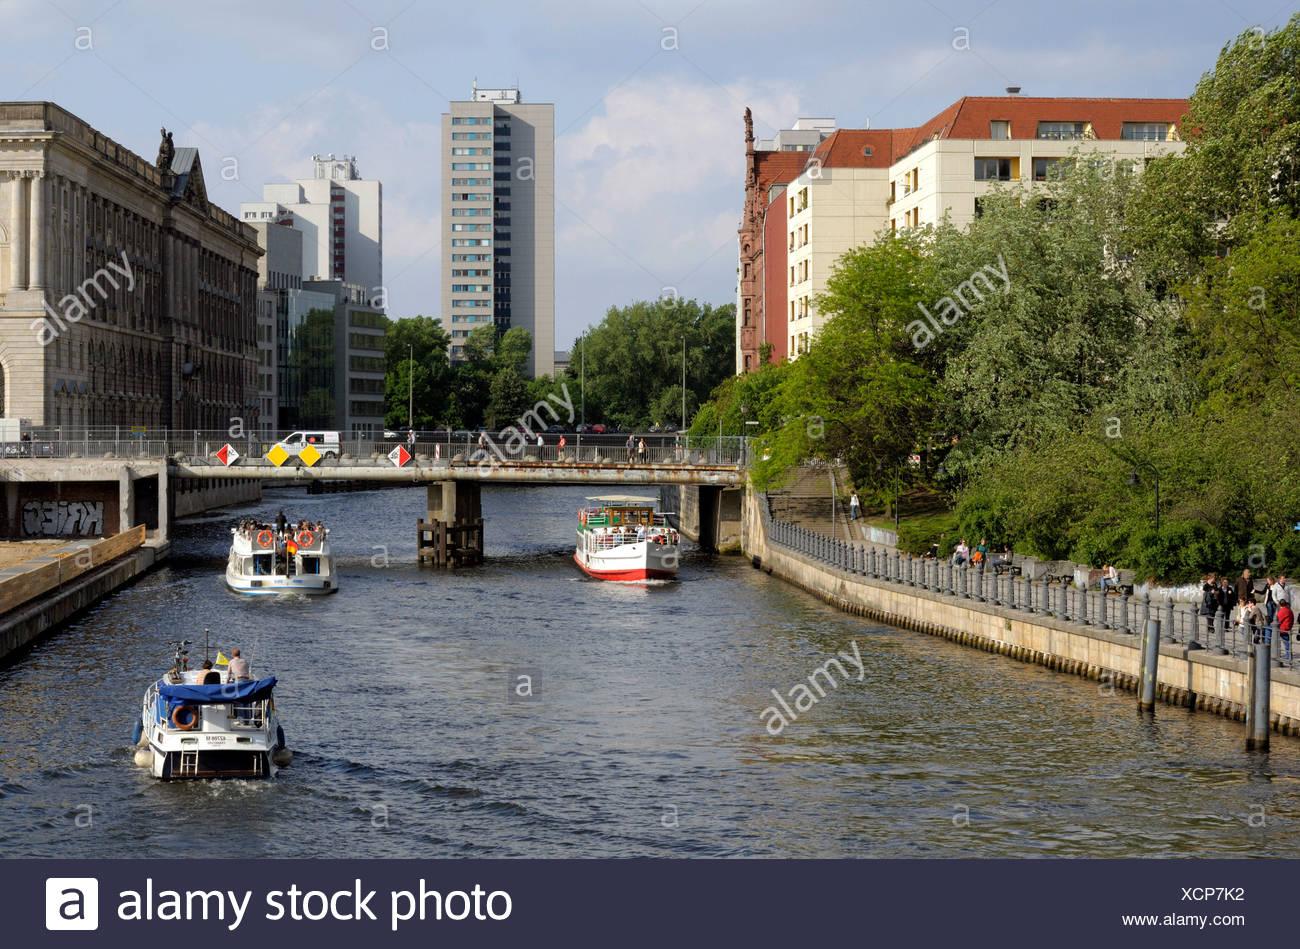 Nikolaiviertel Bezirk mit Spree Fluss, Berlin, Deutschland, Europa Stockbild